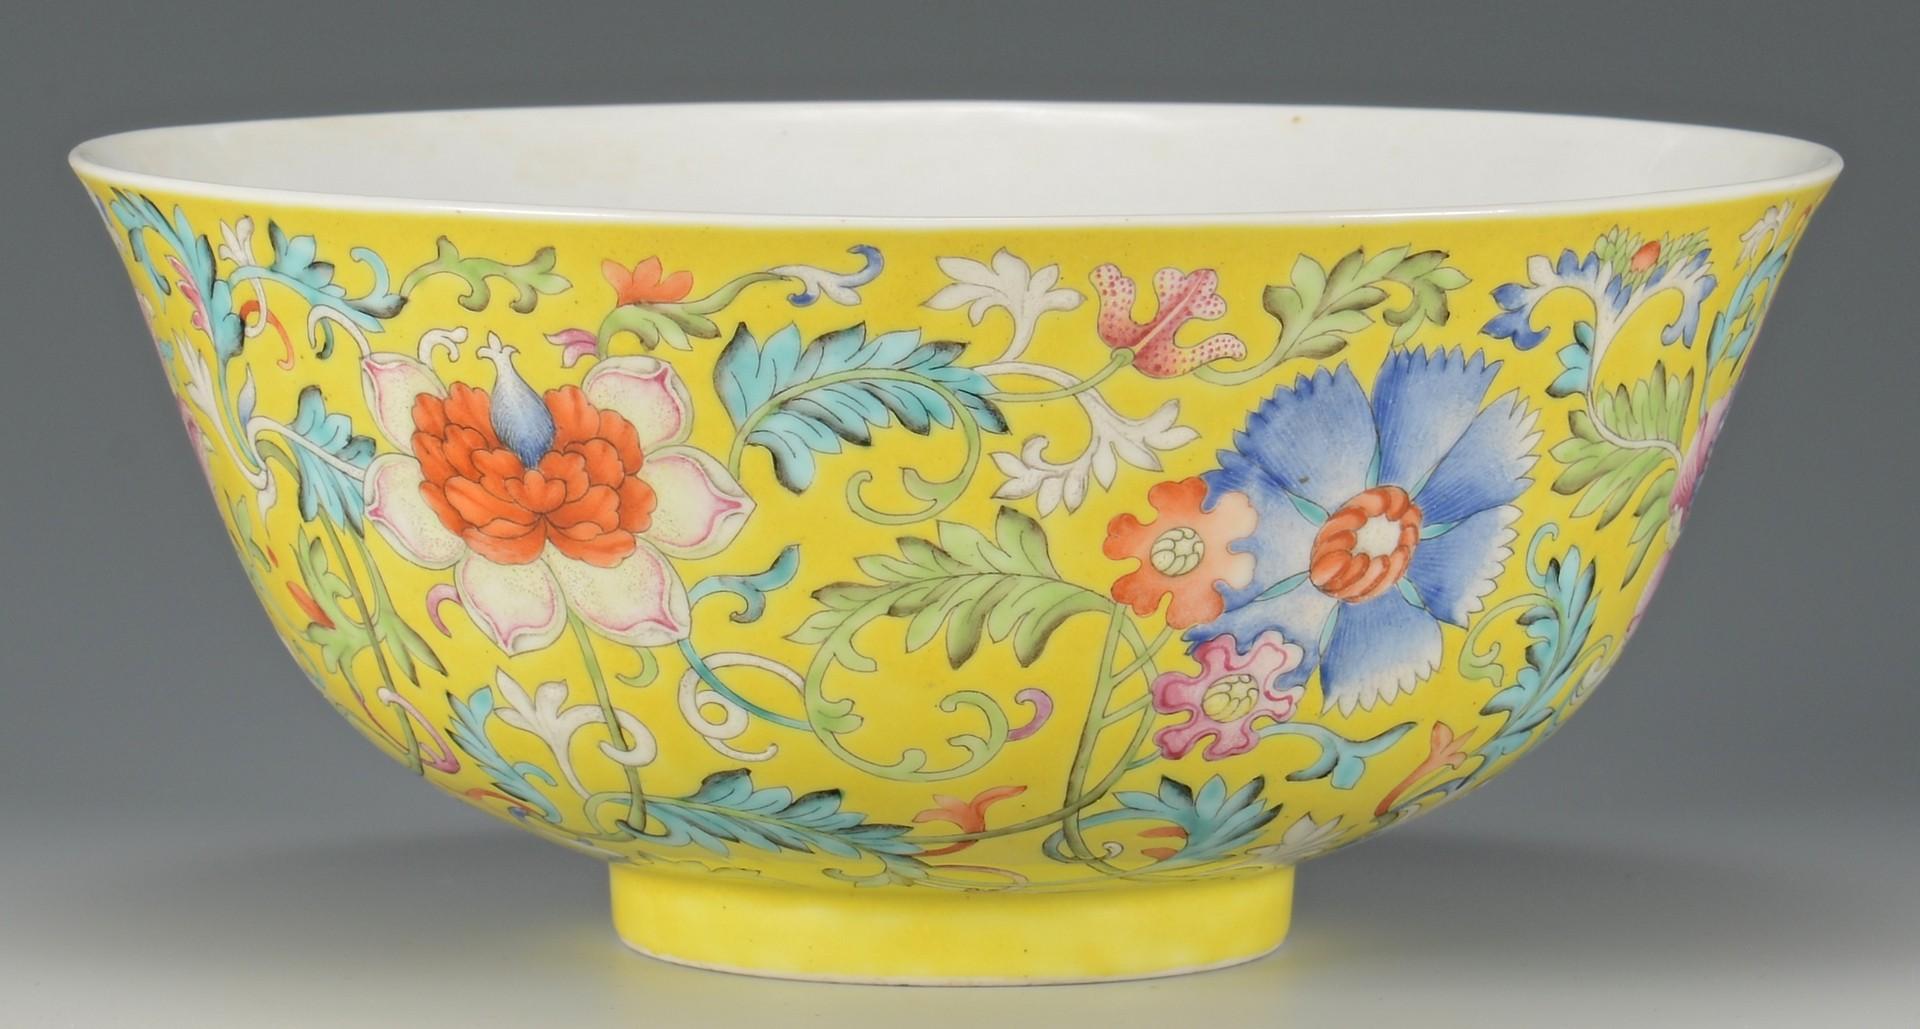 Lot 19: Pr. Guangxu Chinese Famille Rose Bowls, yellow ground